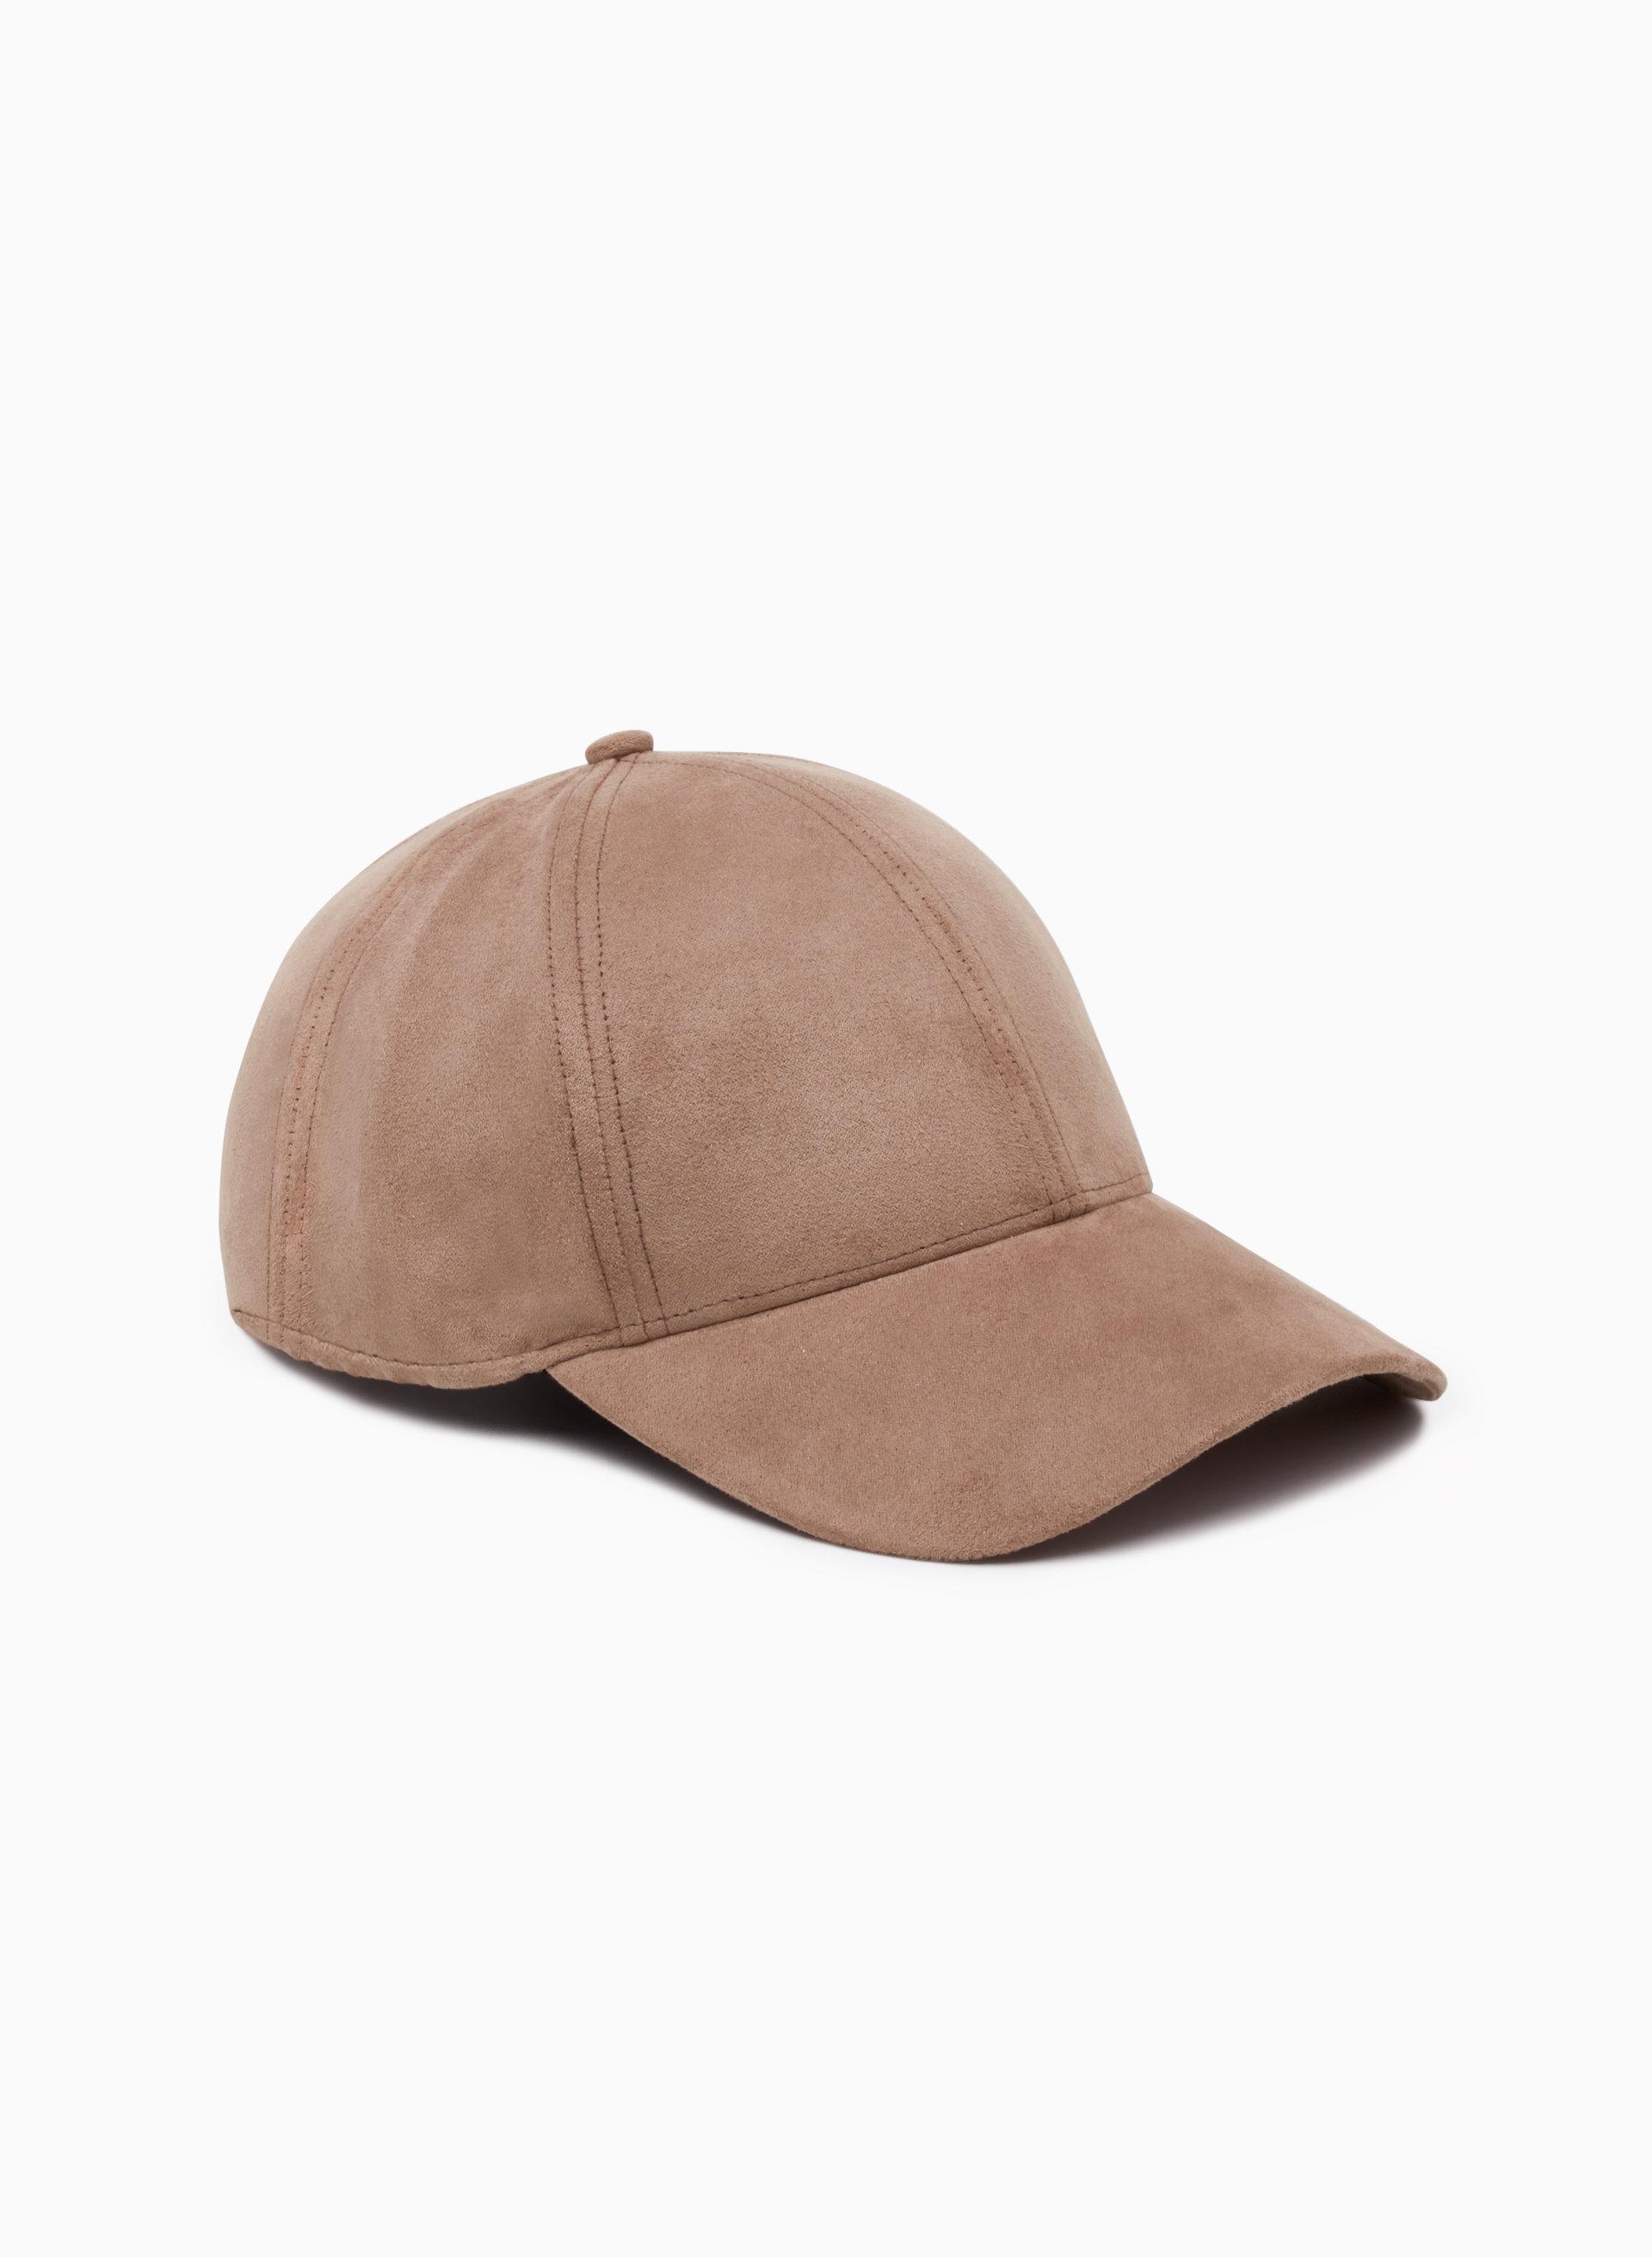 ac4de299556 ... Wilfred Free EMESA HAT